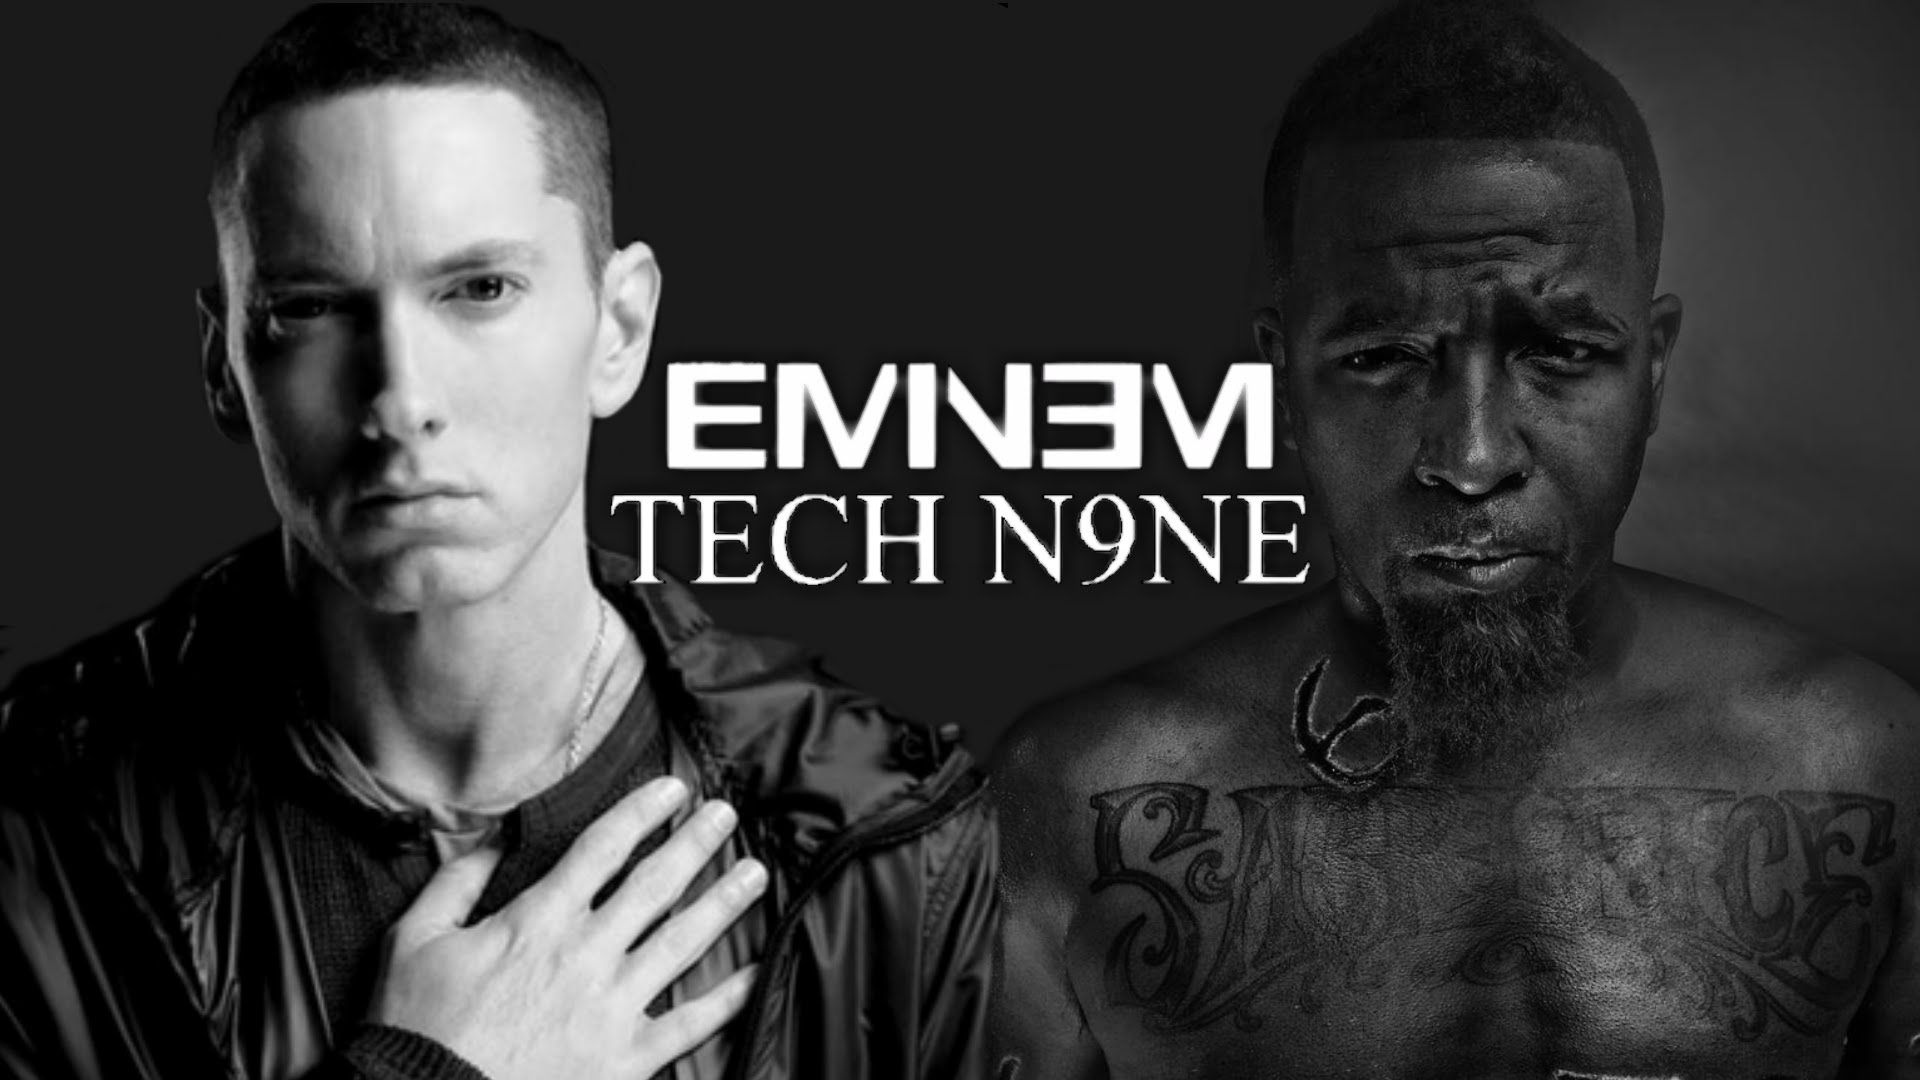 eminem tech n9ne, eminem tech n9ne featuring, eminem tech n9ne speedom